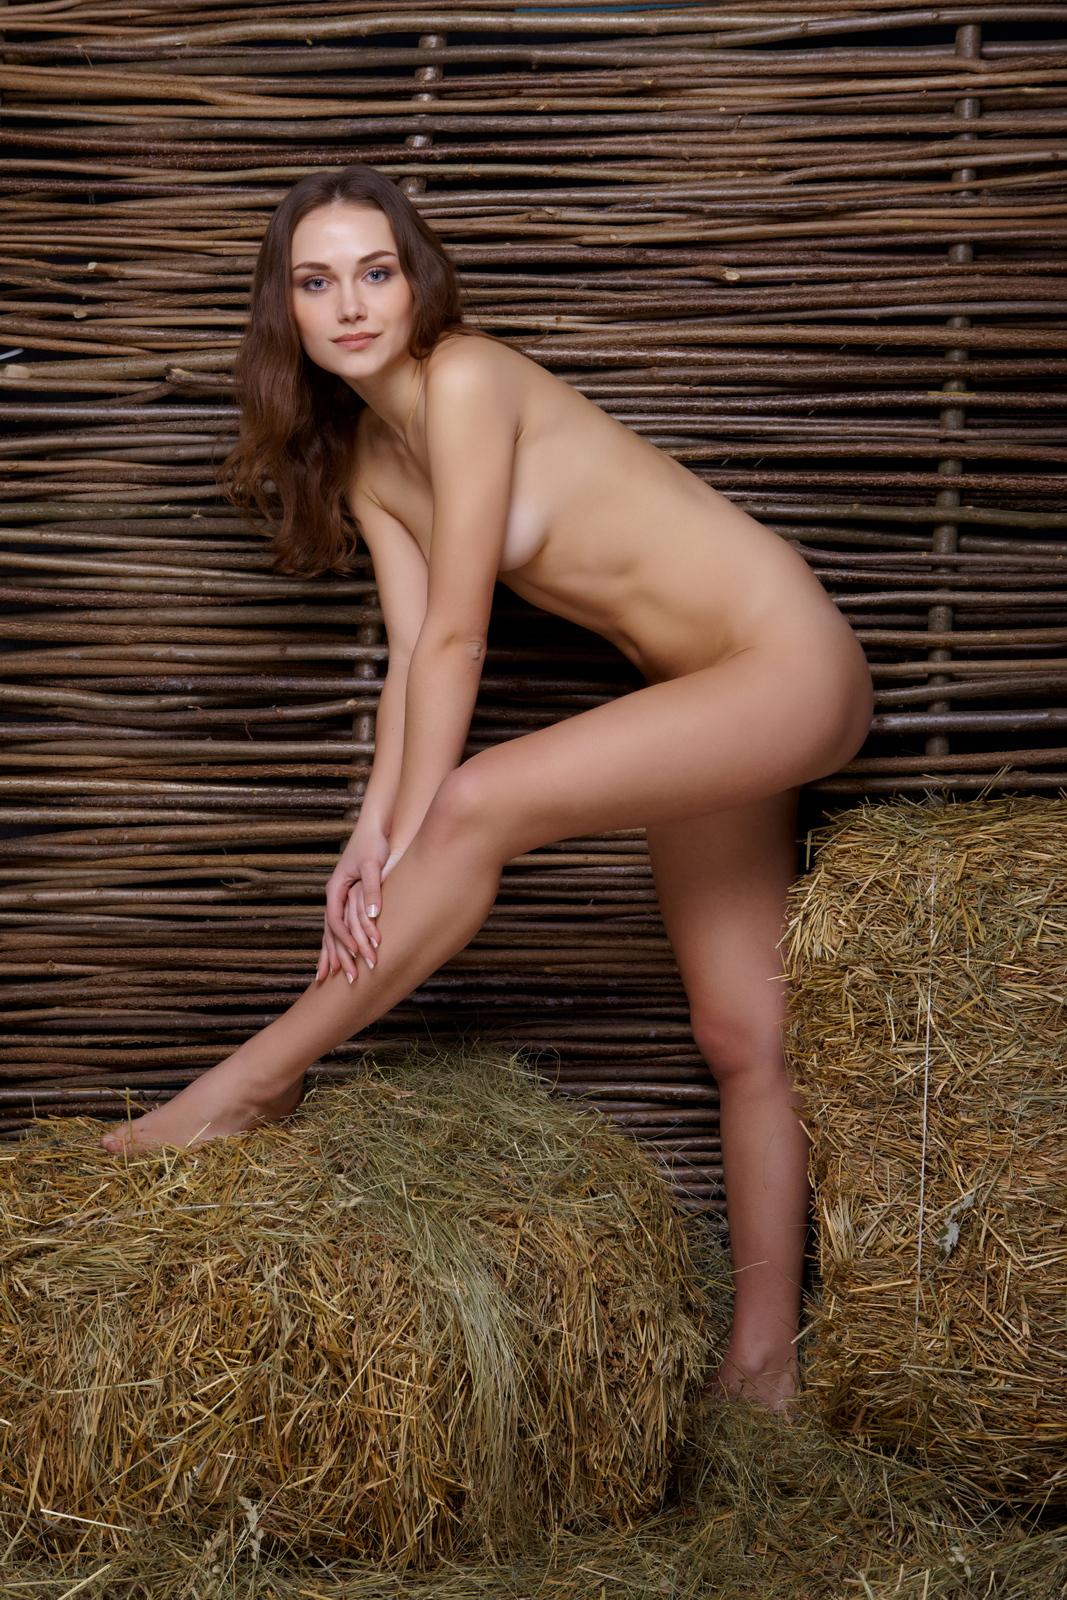 zlatka-a-nude-on-hay-barn-pussy-metart-10